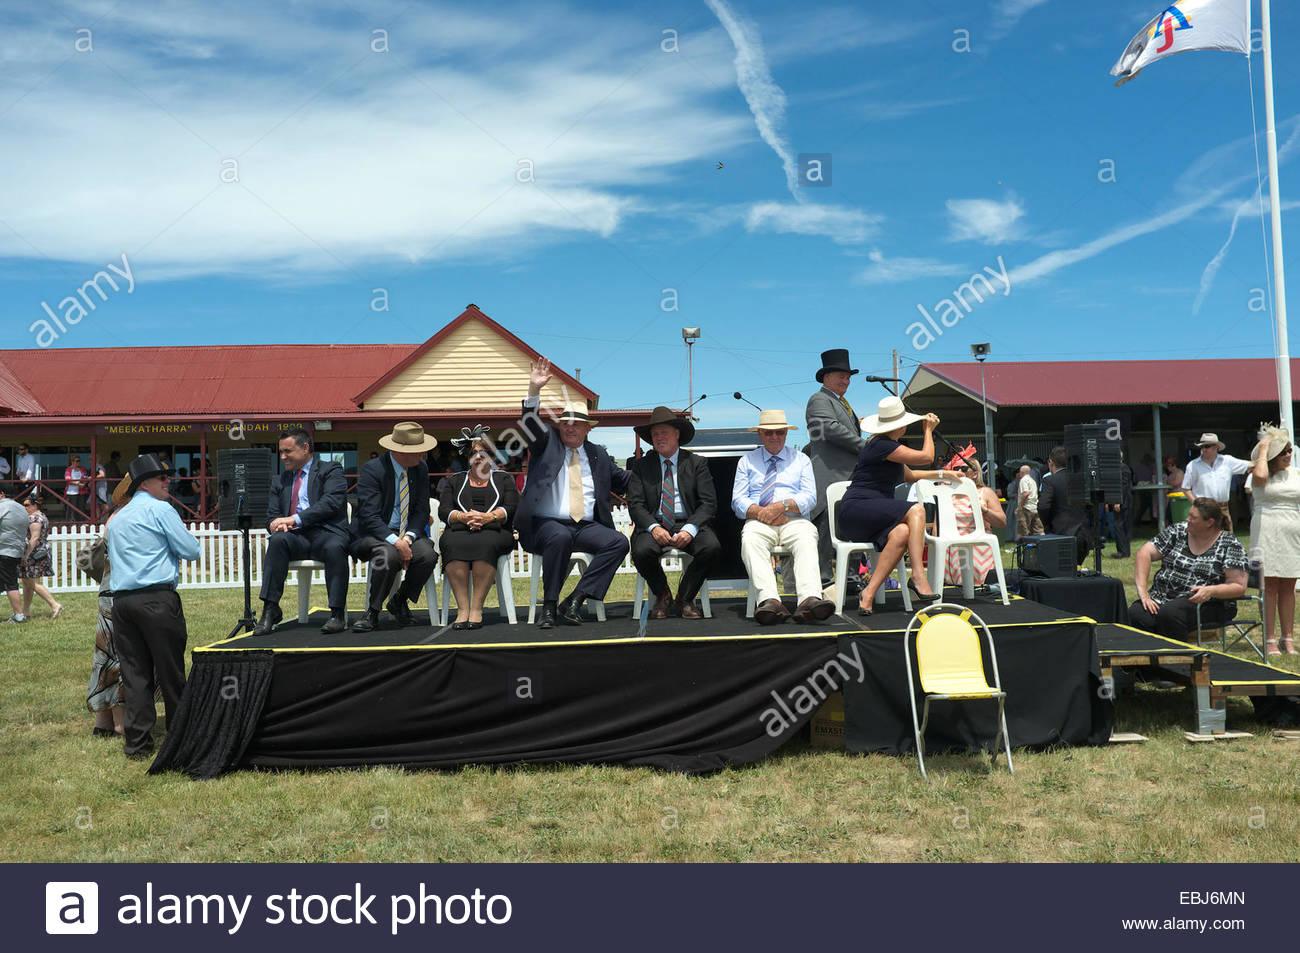 Dignitaries, including Governor-General of Australia Sir Peter John Cosgrove waving, at Adaminaby Races, NSW, Australia - Stock Image